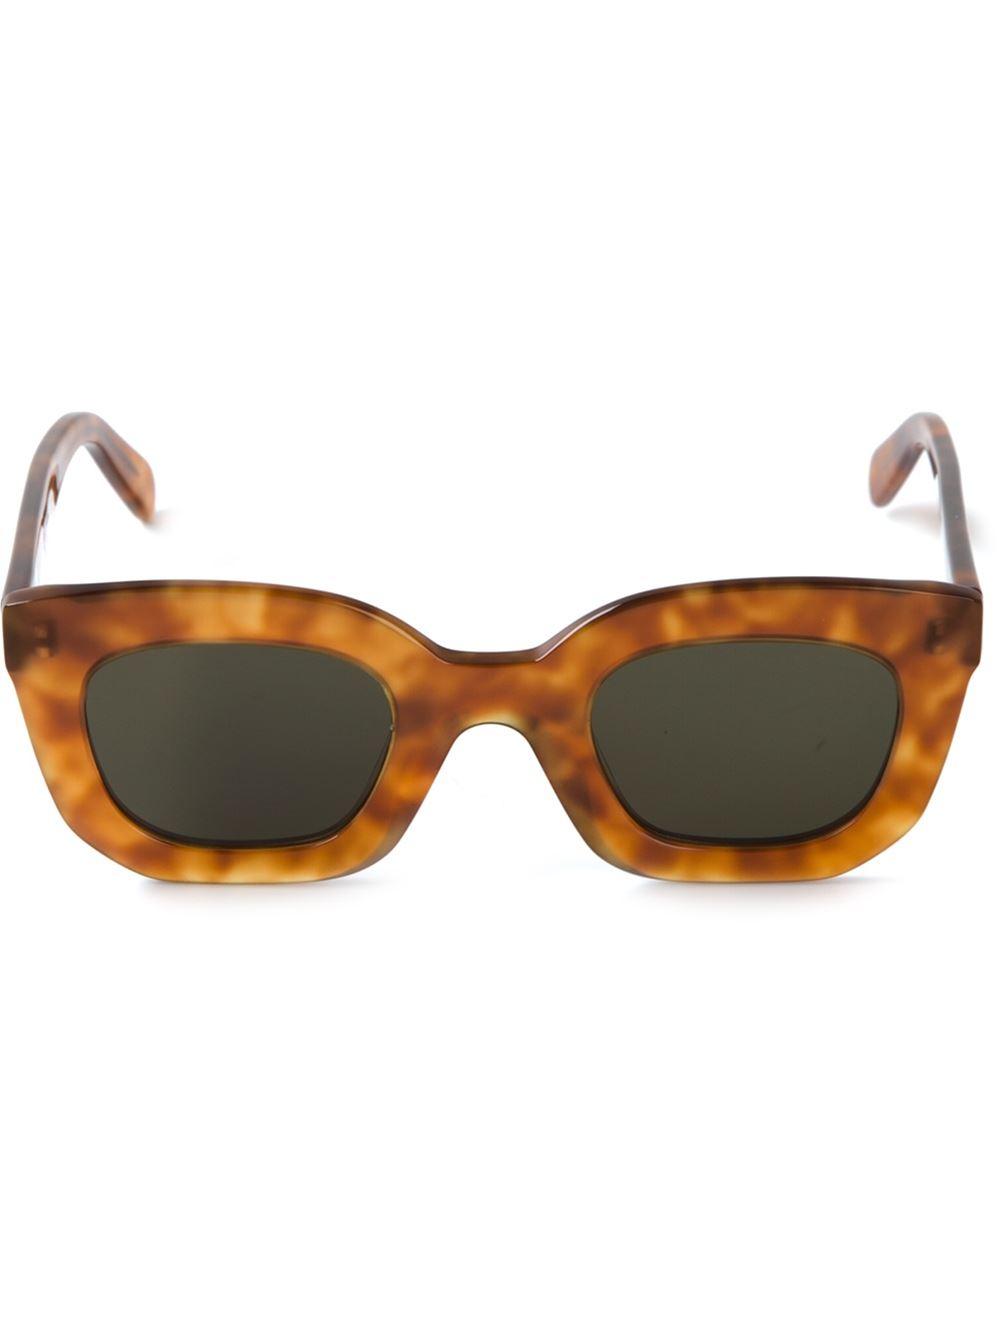 96194d9c591 Celine Marta Small Sunglasses 052115